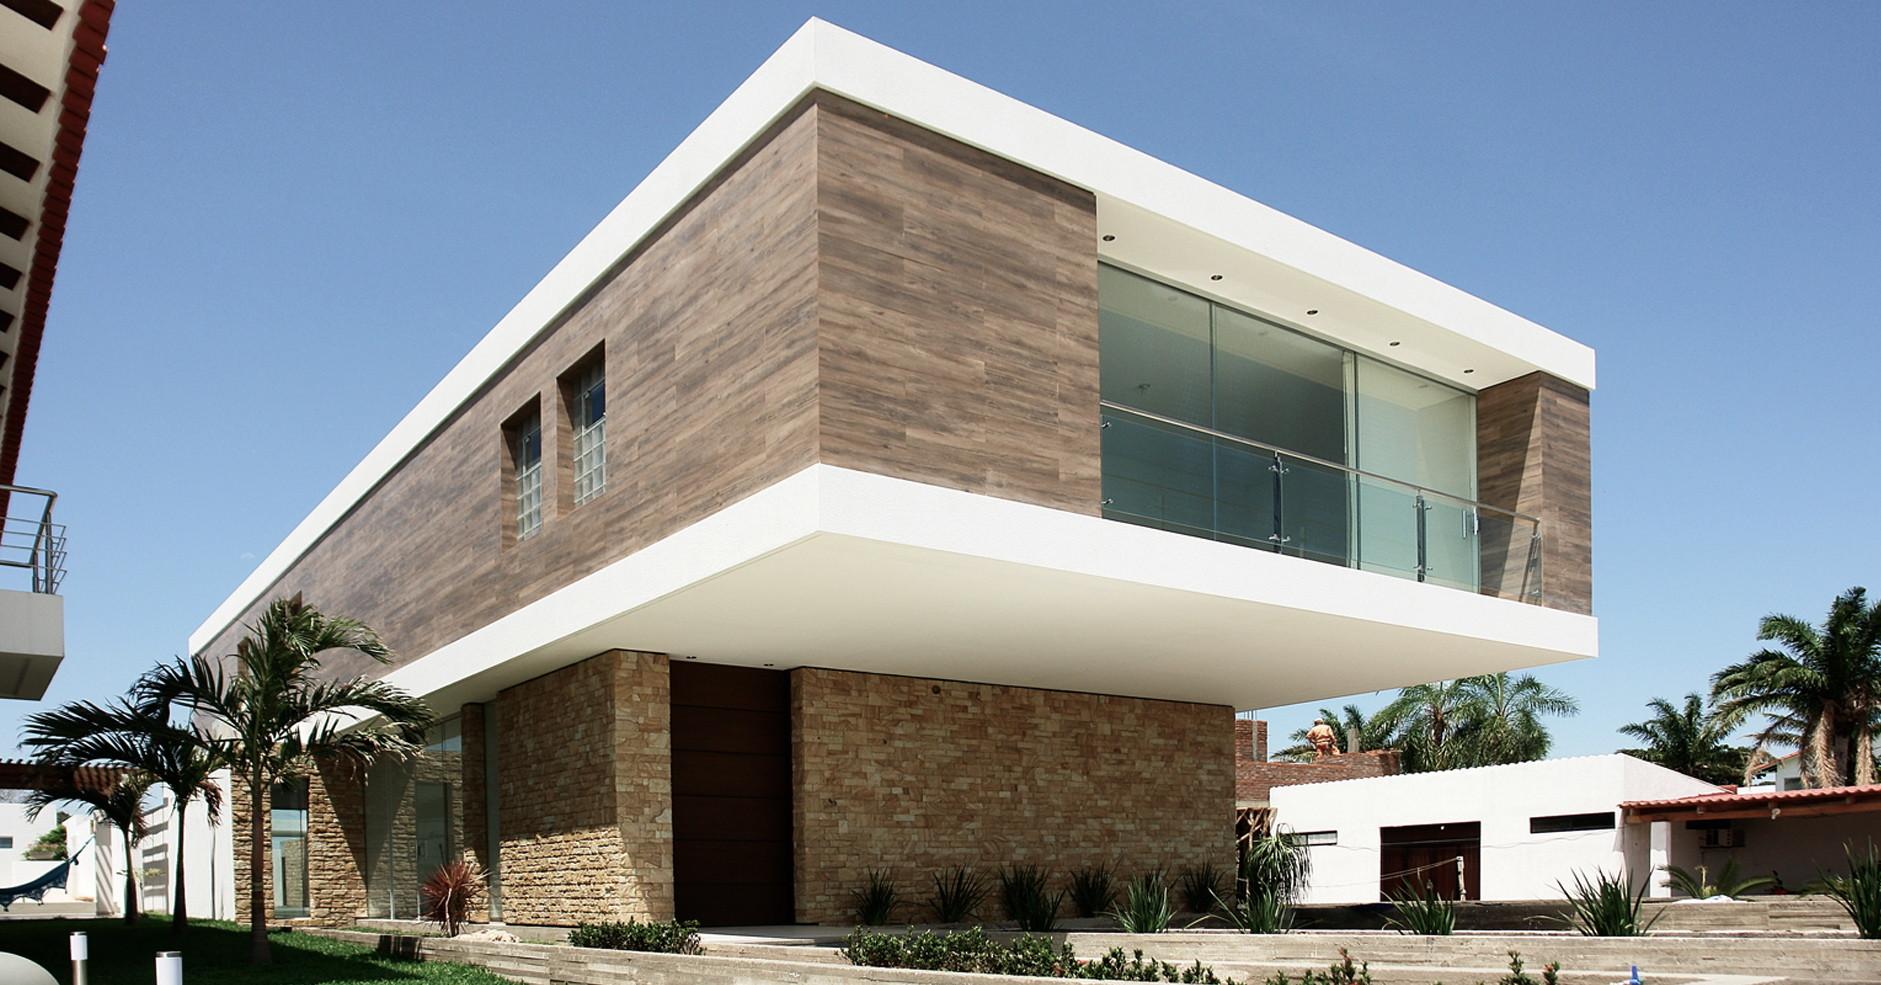 C house sommet asociados archdaily for Casa la mansion santa cruz bolivia